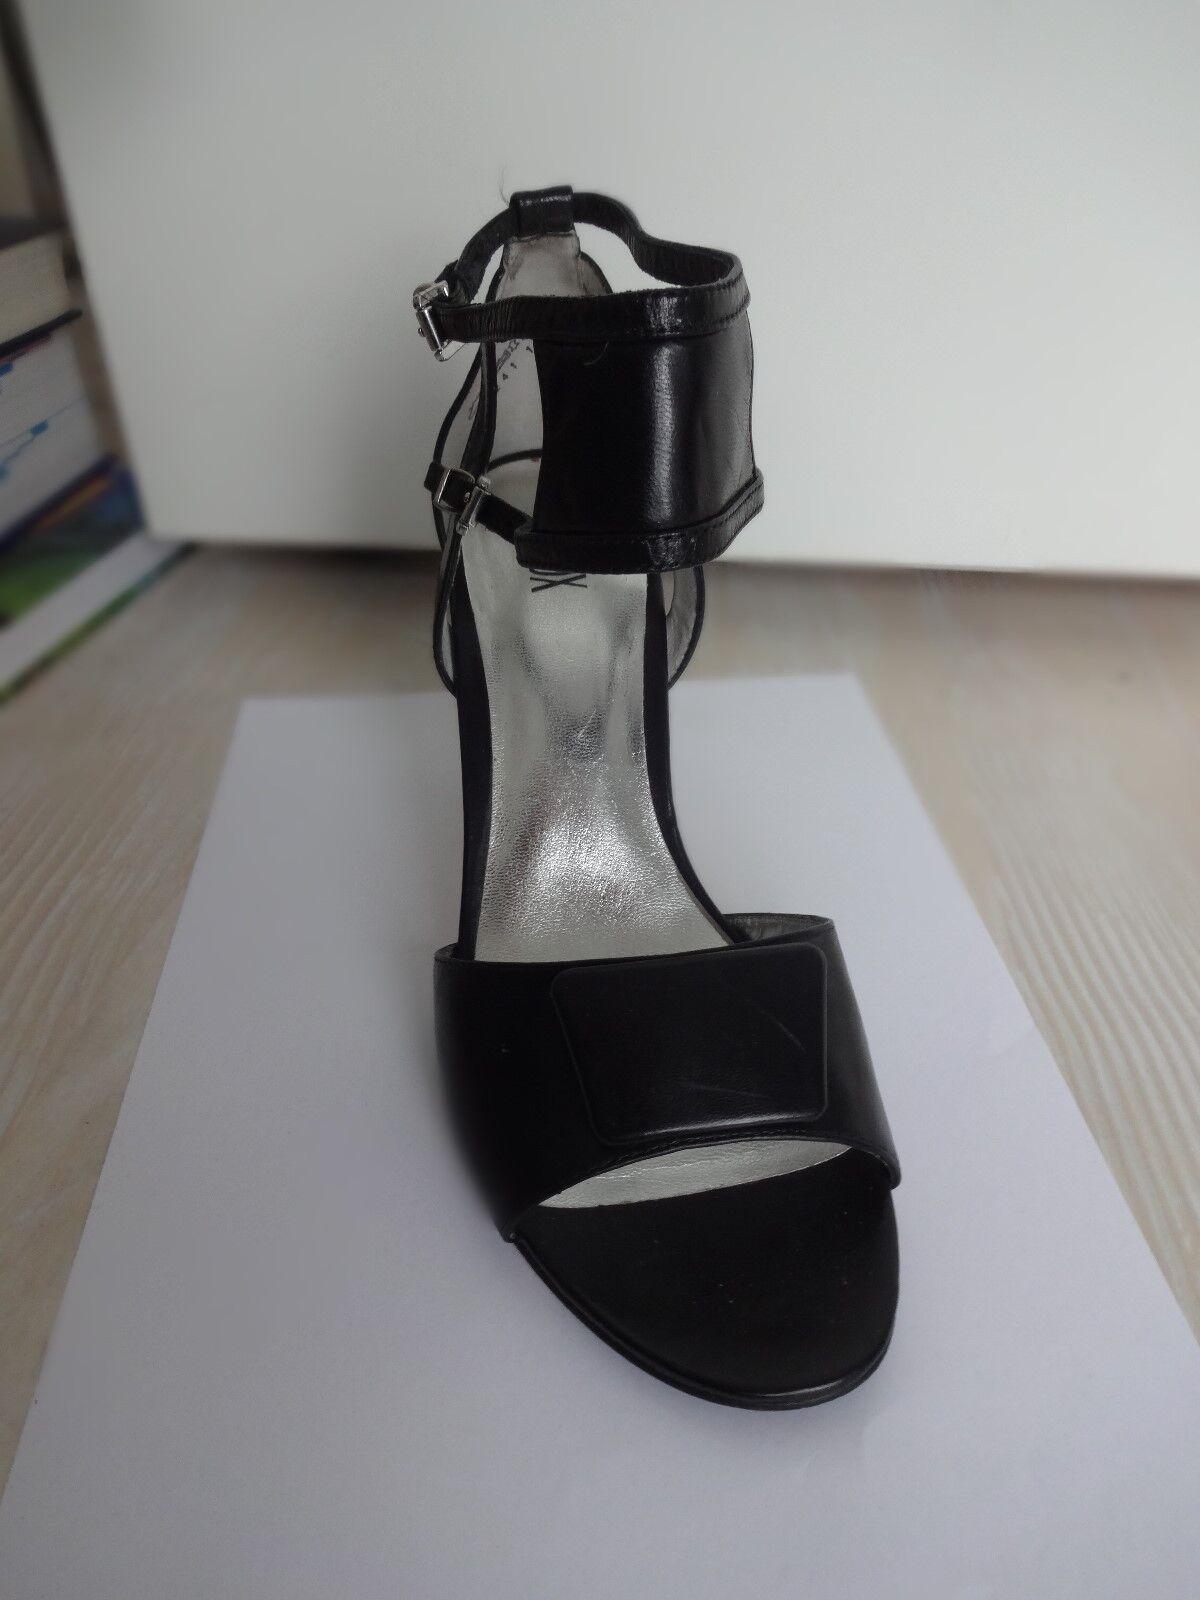 OXMOX Sandale Sandalette Gr. 39 Leder schwarz neuwertig